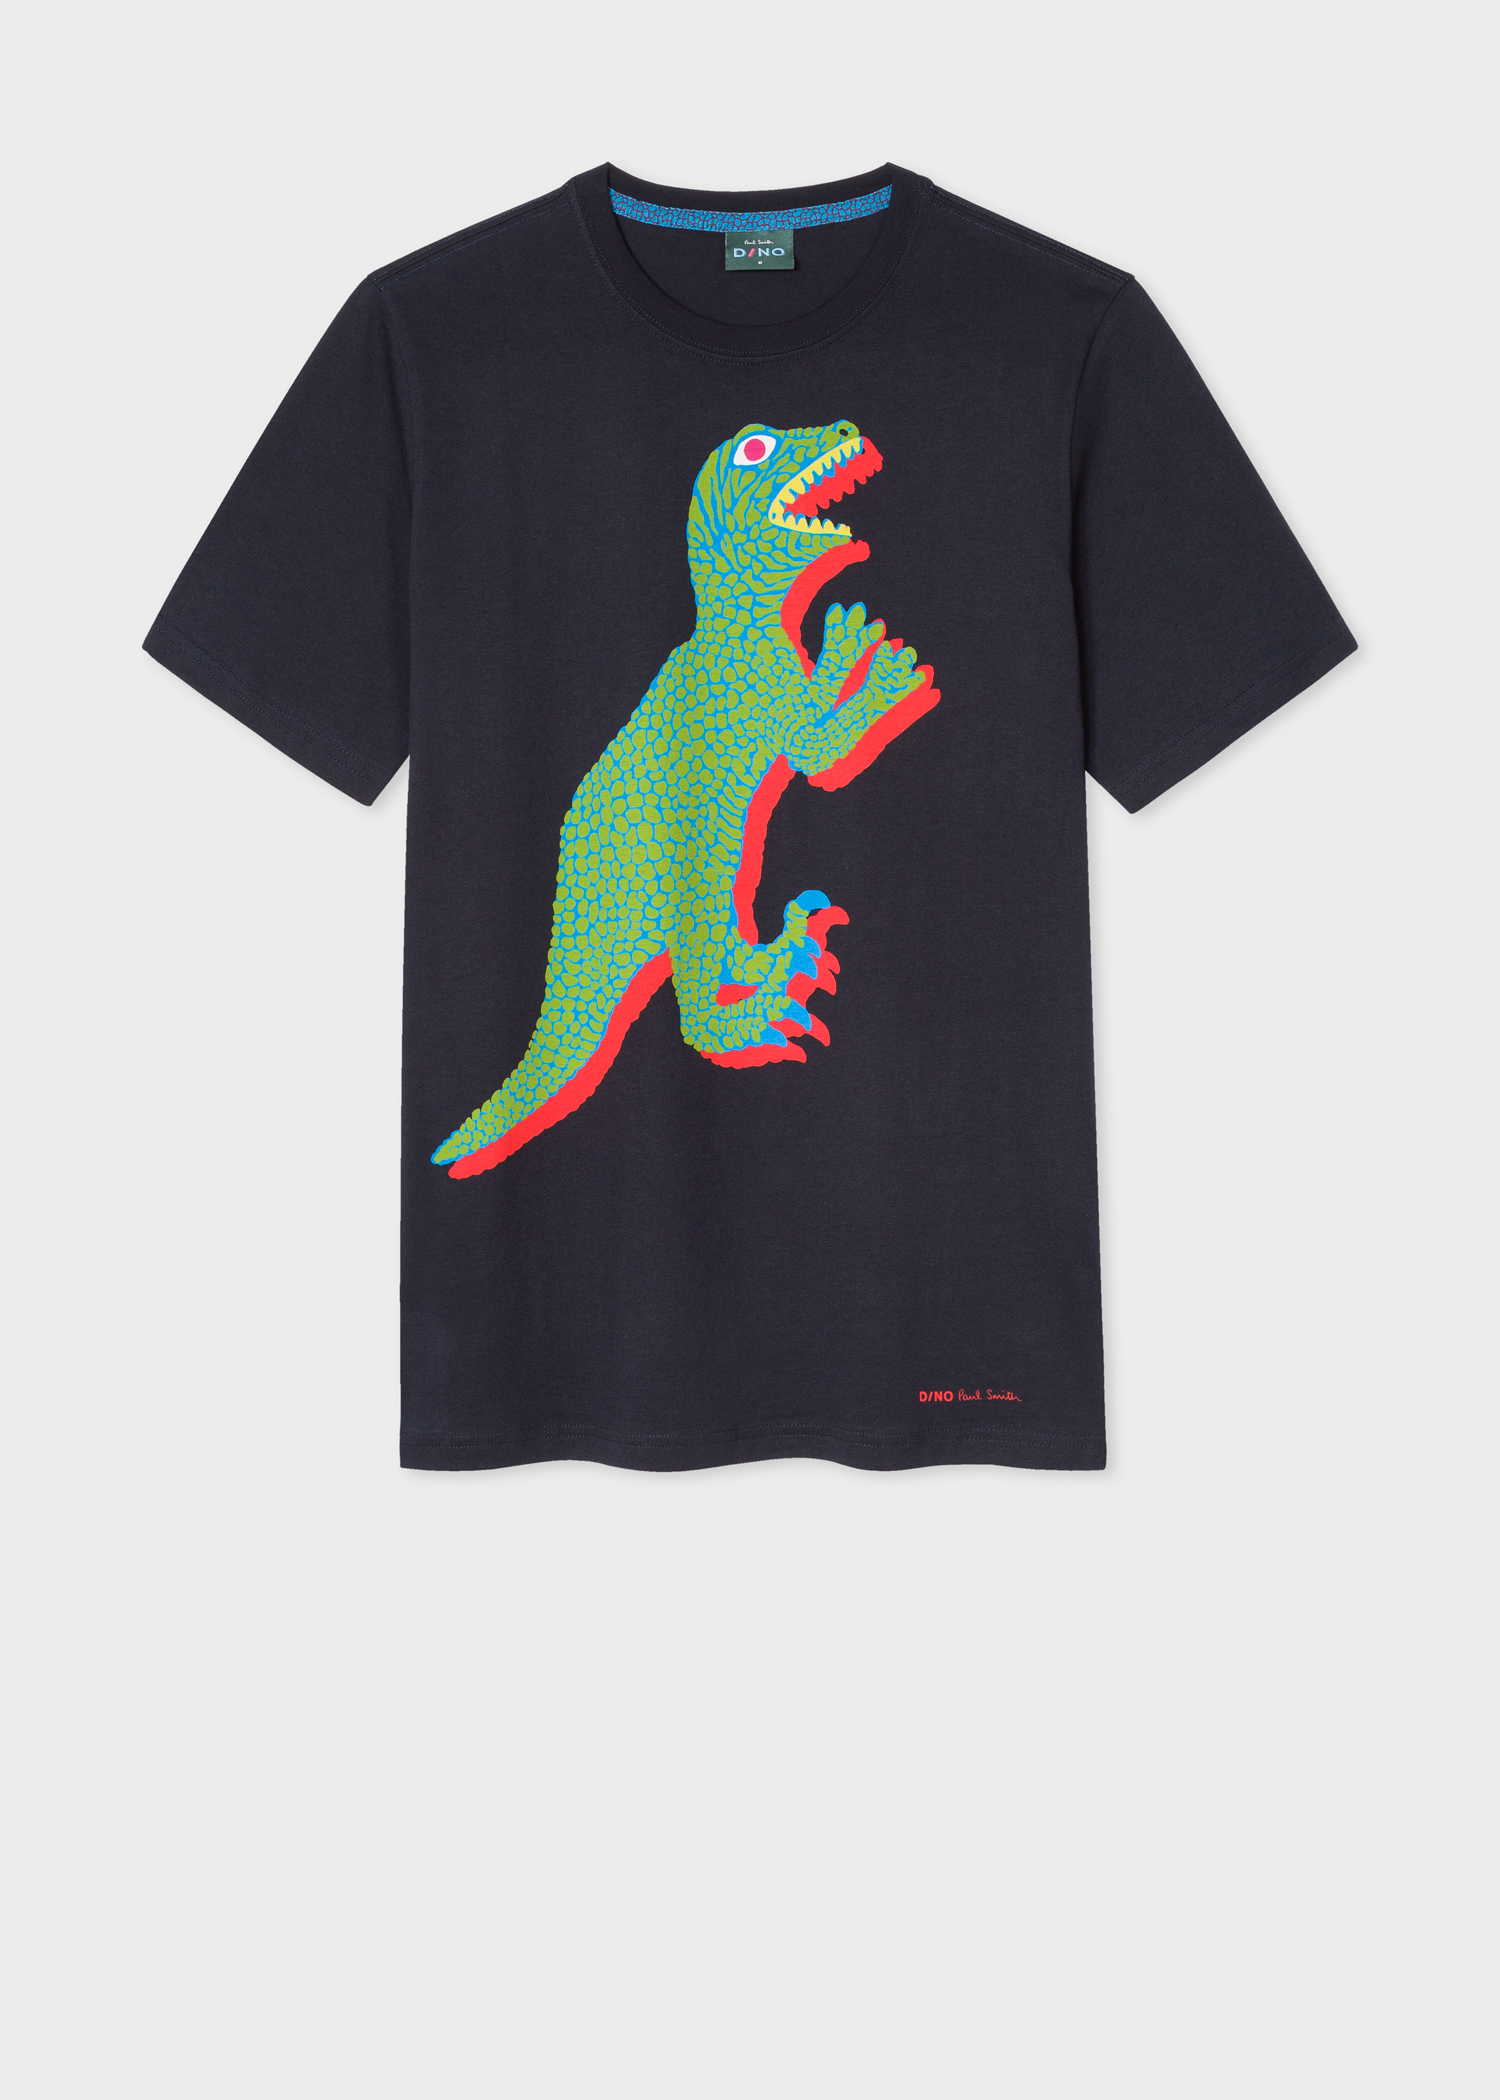 2aa65dd4 Men's Navy Large 'Dino' Print Organic-Cotton T-Shirt - Paul Smith Asia